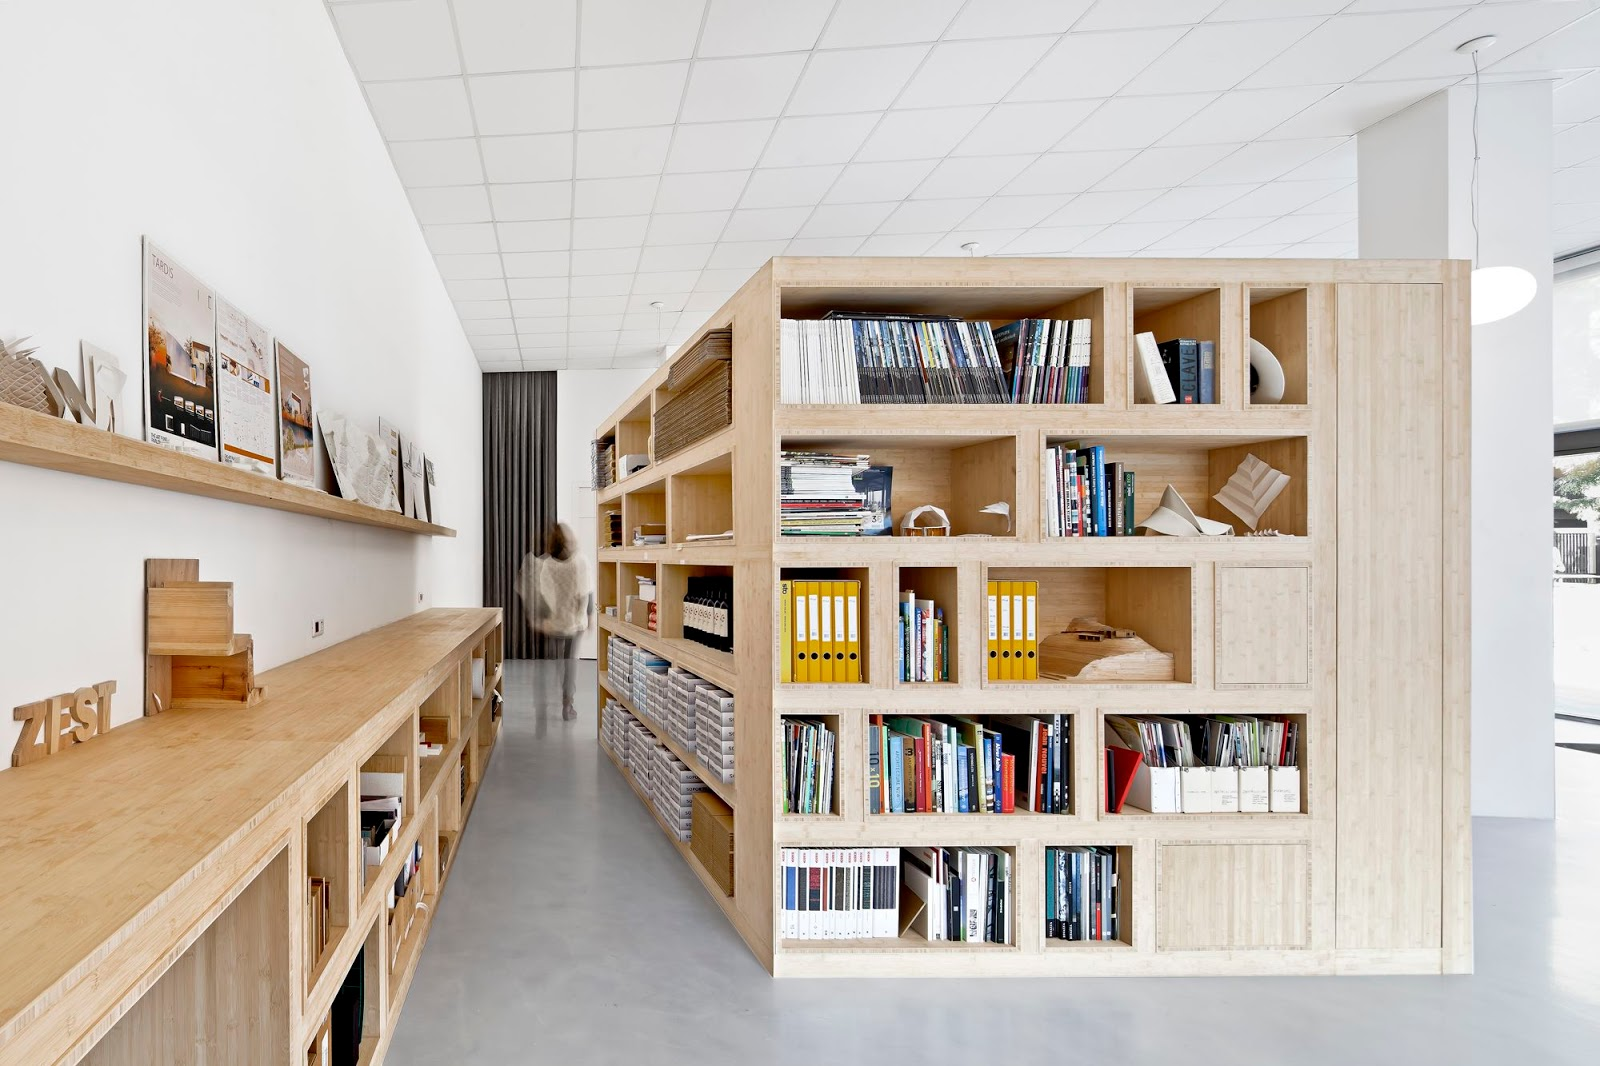 A f a s i a zest architecture for Oficinas de trabajo temporal en barcelona